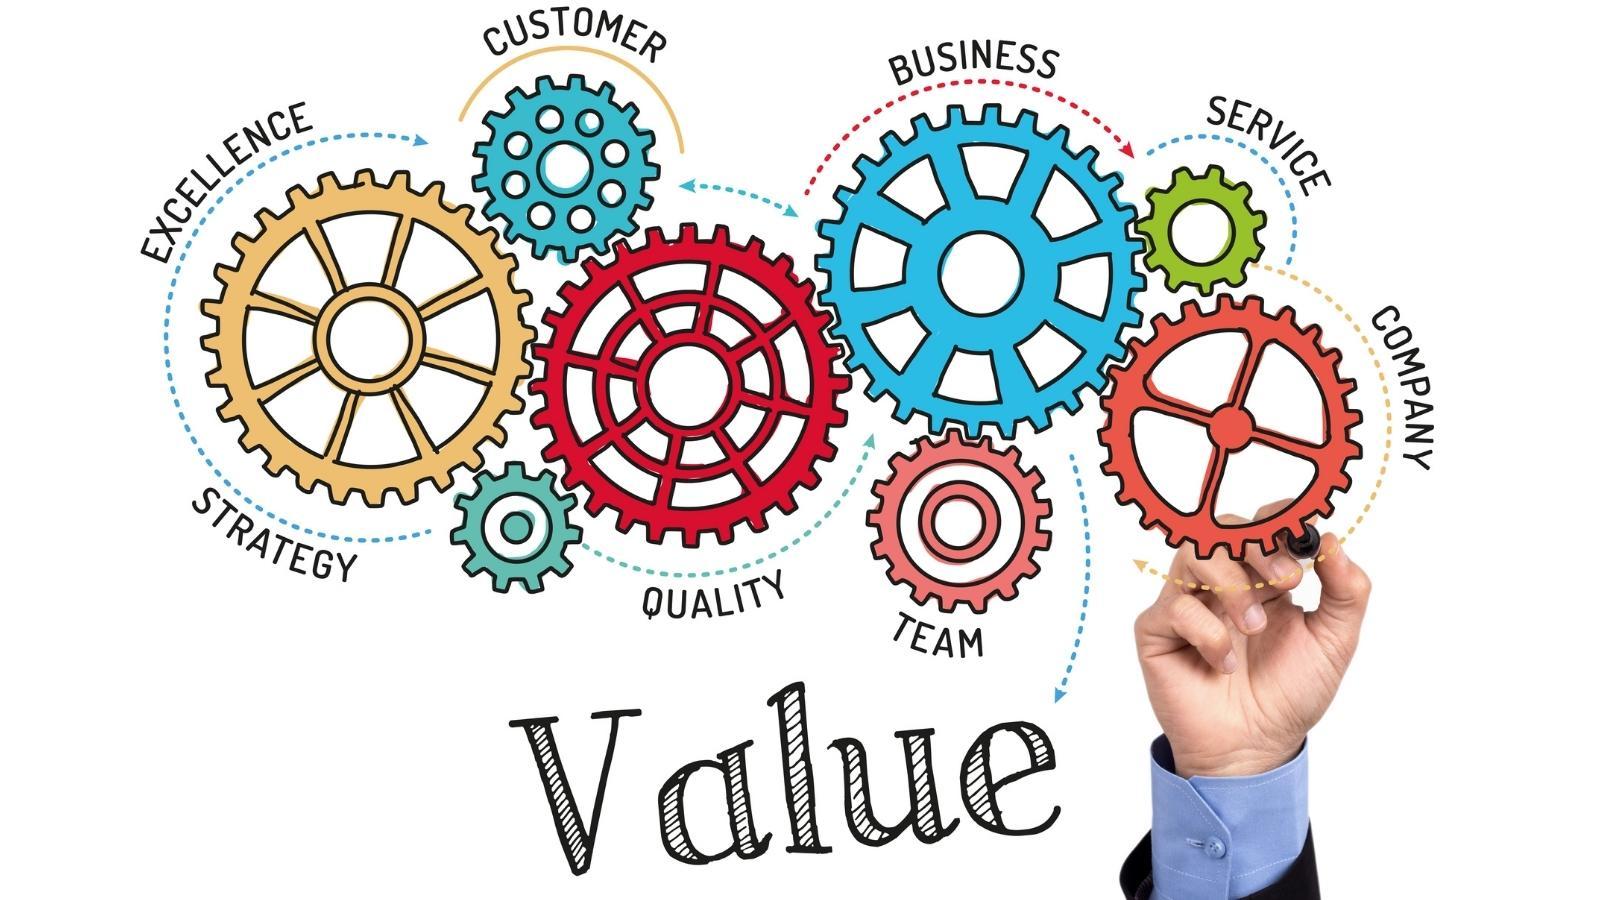 share value as a helpful entrepreneur